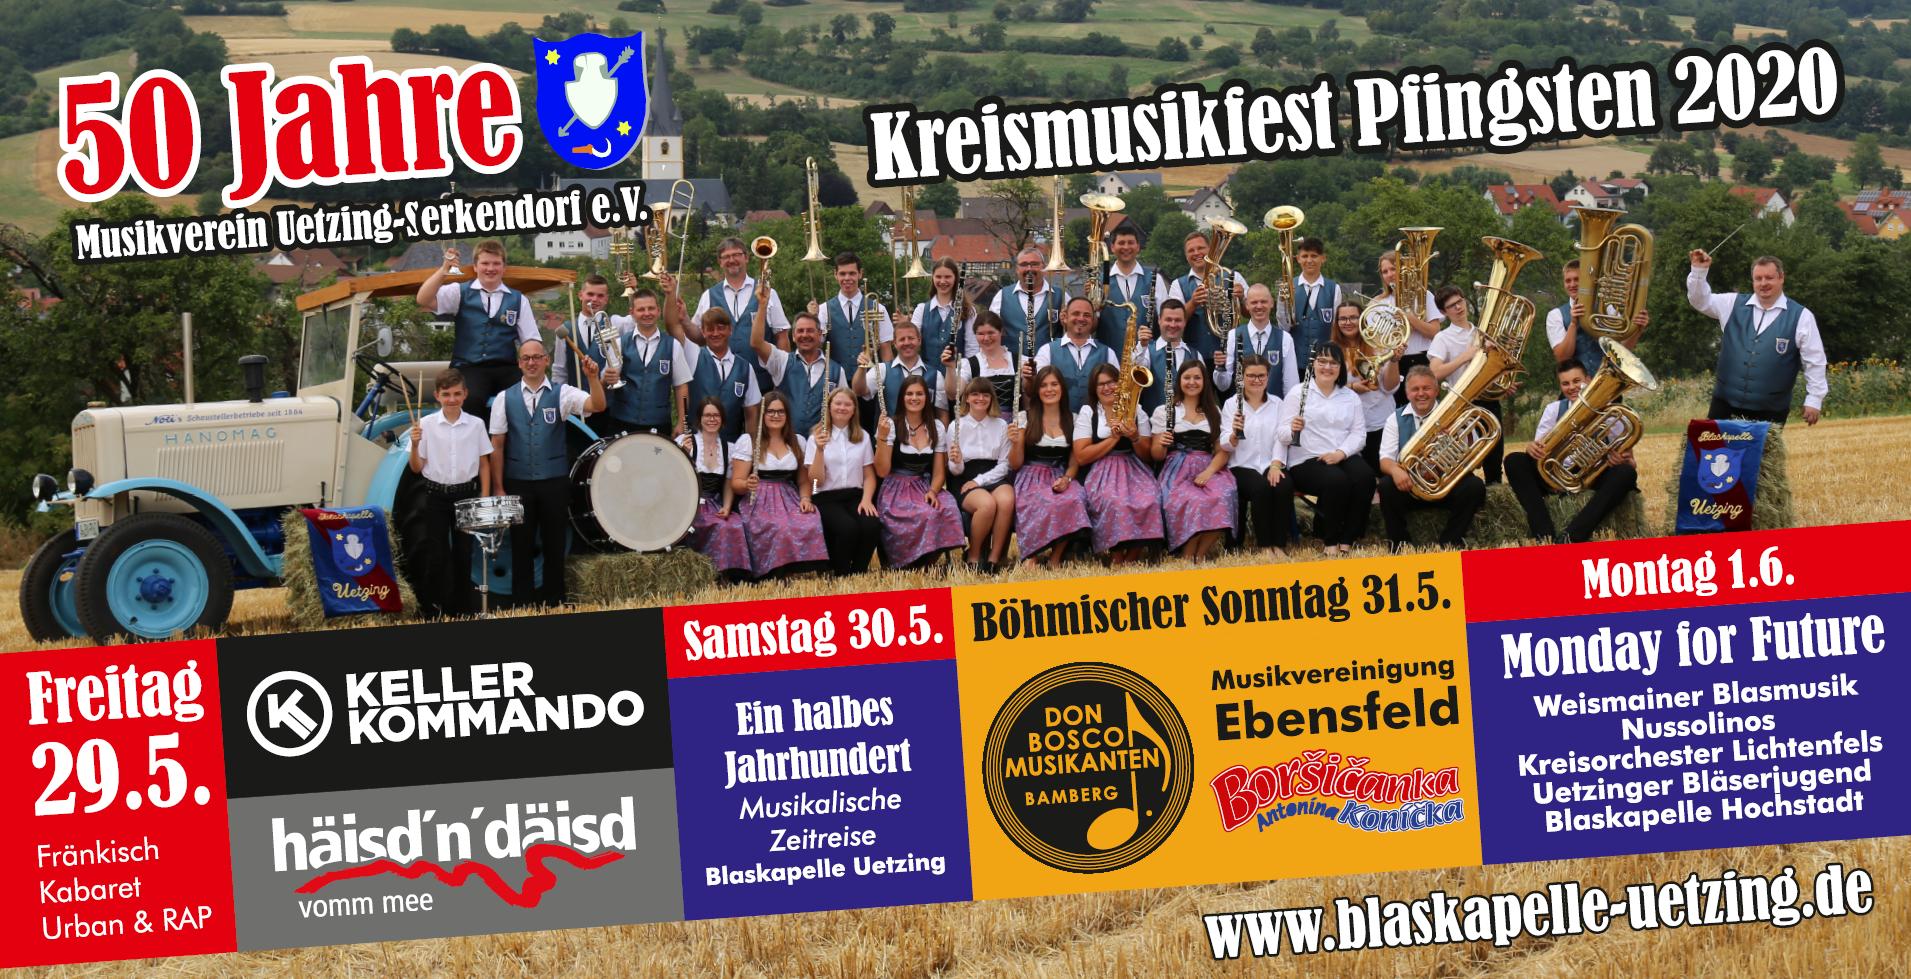 Musikverein Uetzing-Serkendorf e.V.